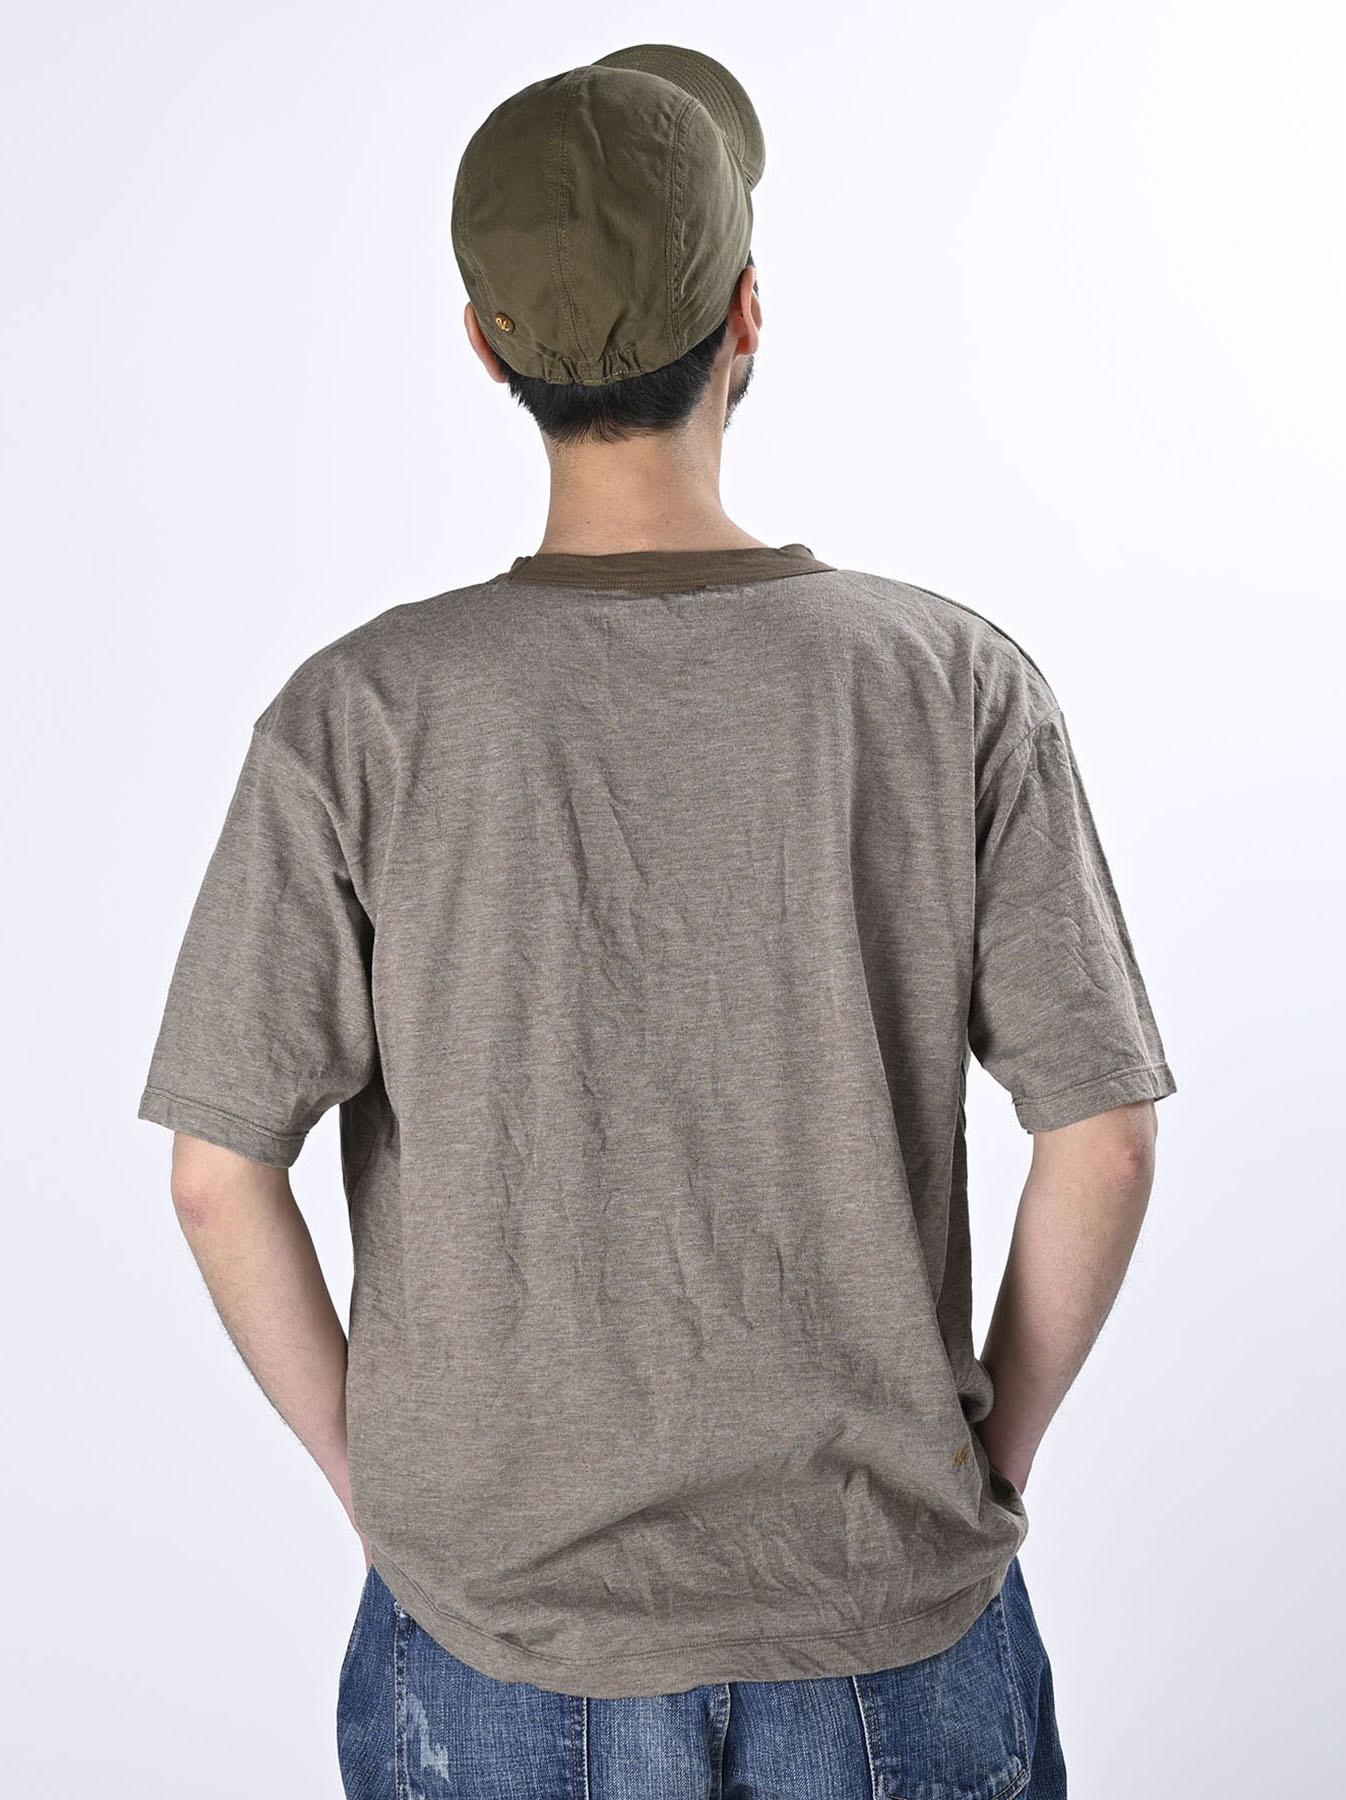 US Tenjiku Paddling 908 Ocean T-Shirt (0521)-6